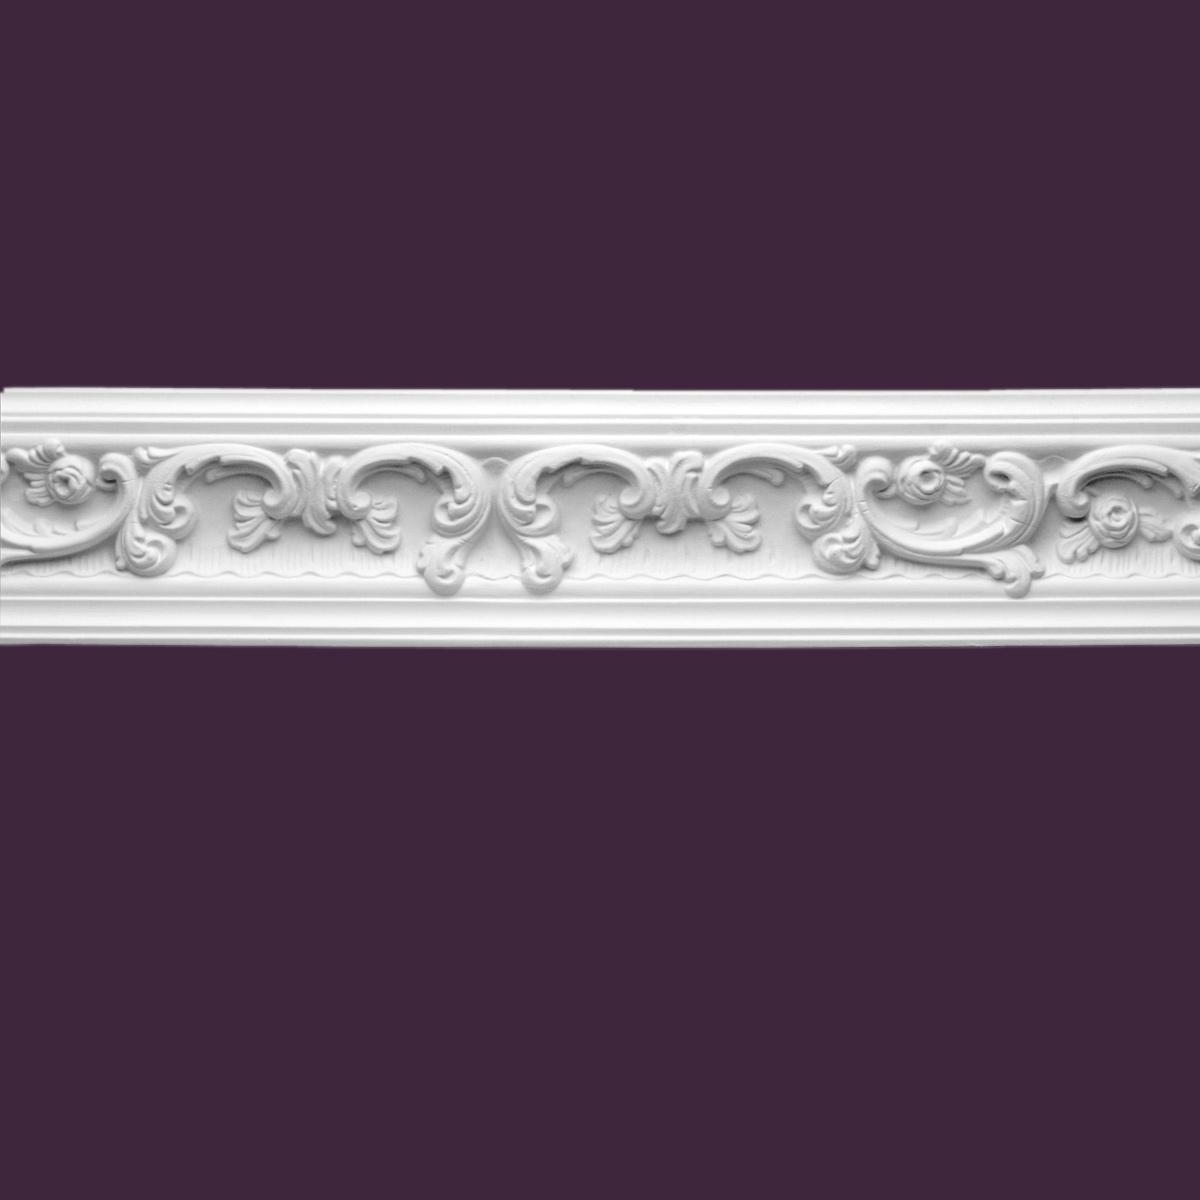 Cornice White Urethane Gilson Sample of 12407 Cornice Cornice Moulding Cornice Molding